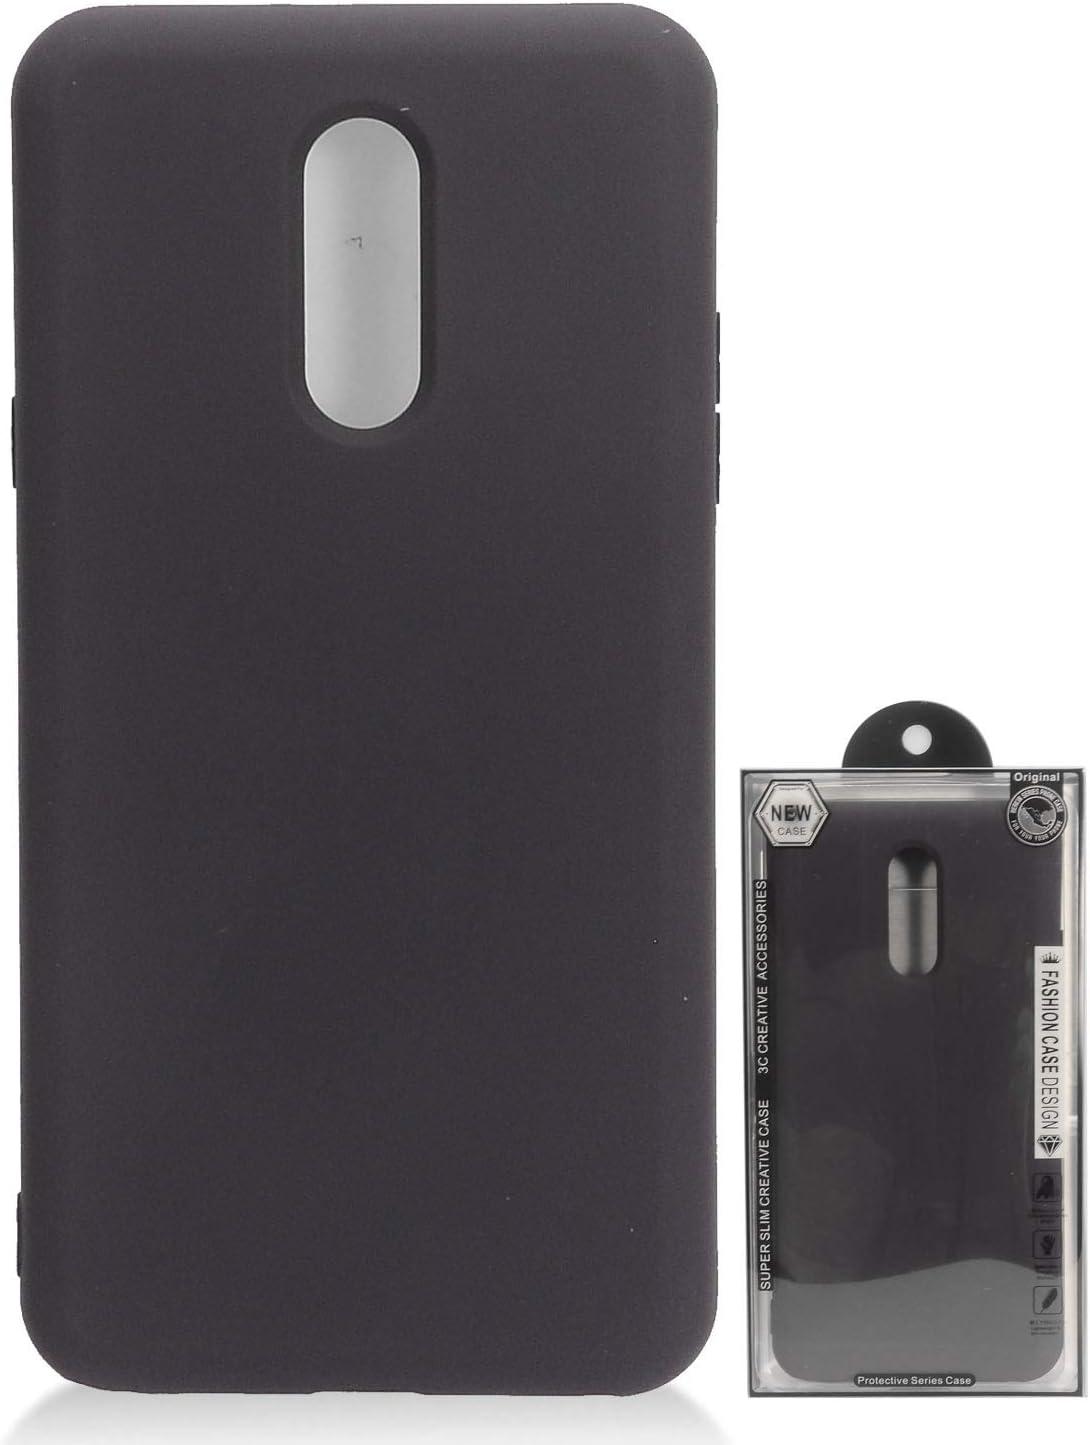 CELZEN - for LG Stylo 5 (2019), Stylo 5X, Stylo5+ Plus, LM-Q720, LM-L722DL - Slim Soft Nano Silicone Phone Case - NS1 Navy Blue